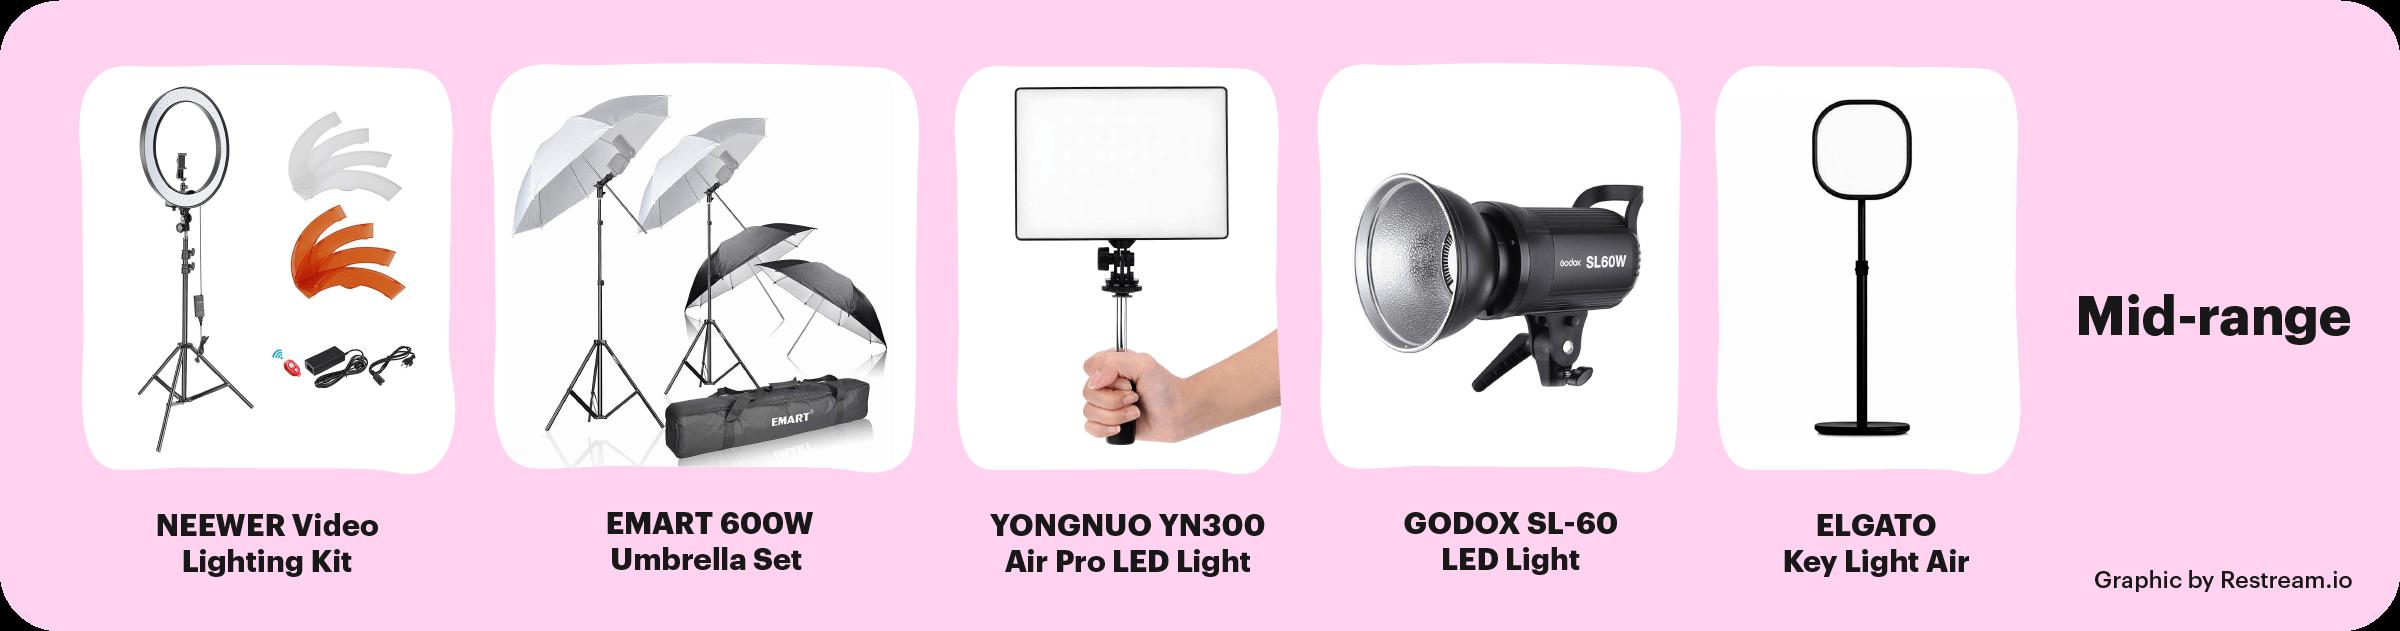 Mid-range video lighting equipment